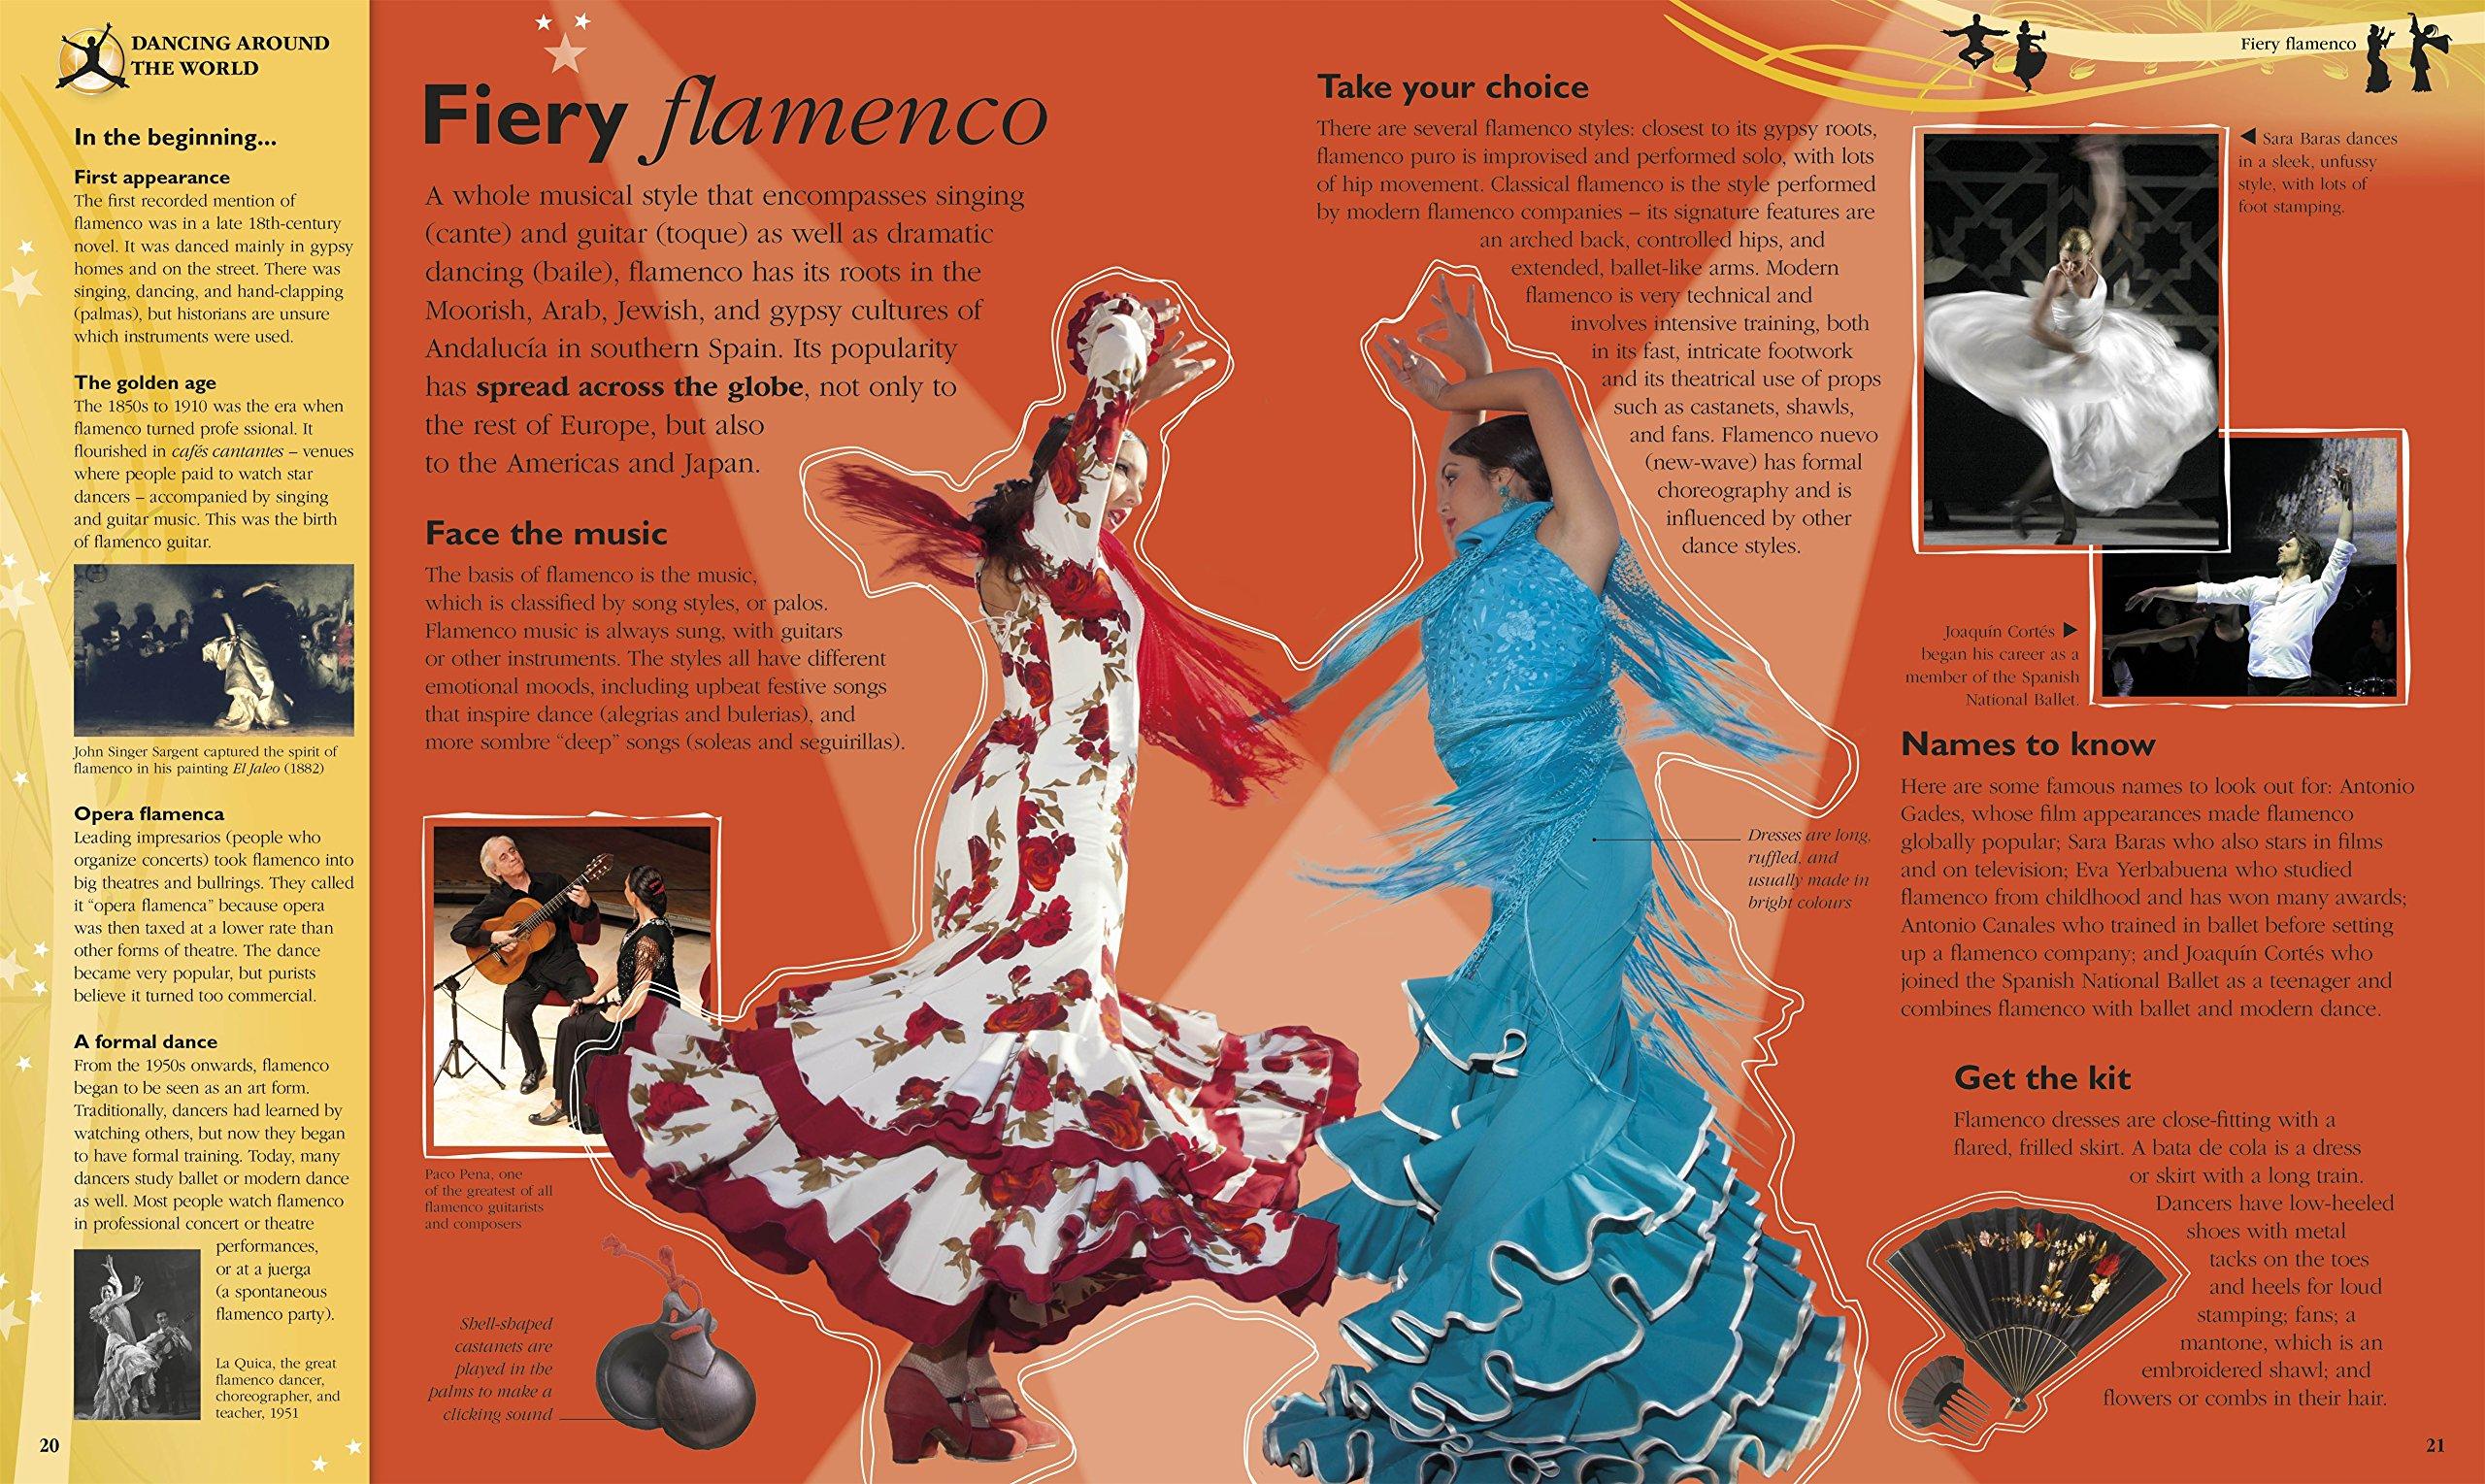 Amazon.com: The Book of Dance (9781405391528): DK: Books